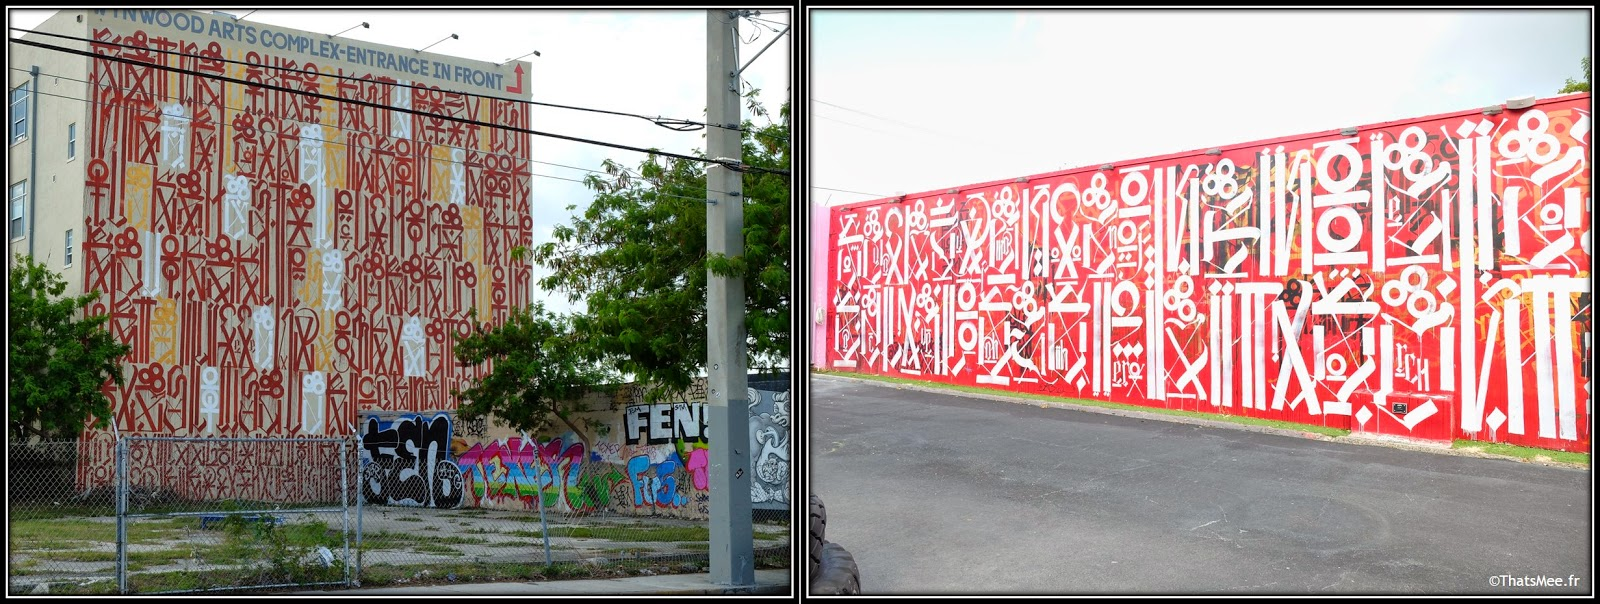 Miami Art Basel street artist Retna signes arabes Wynwood Walls Art District Miami